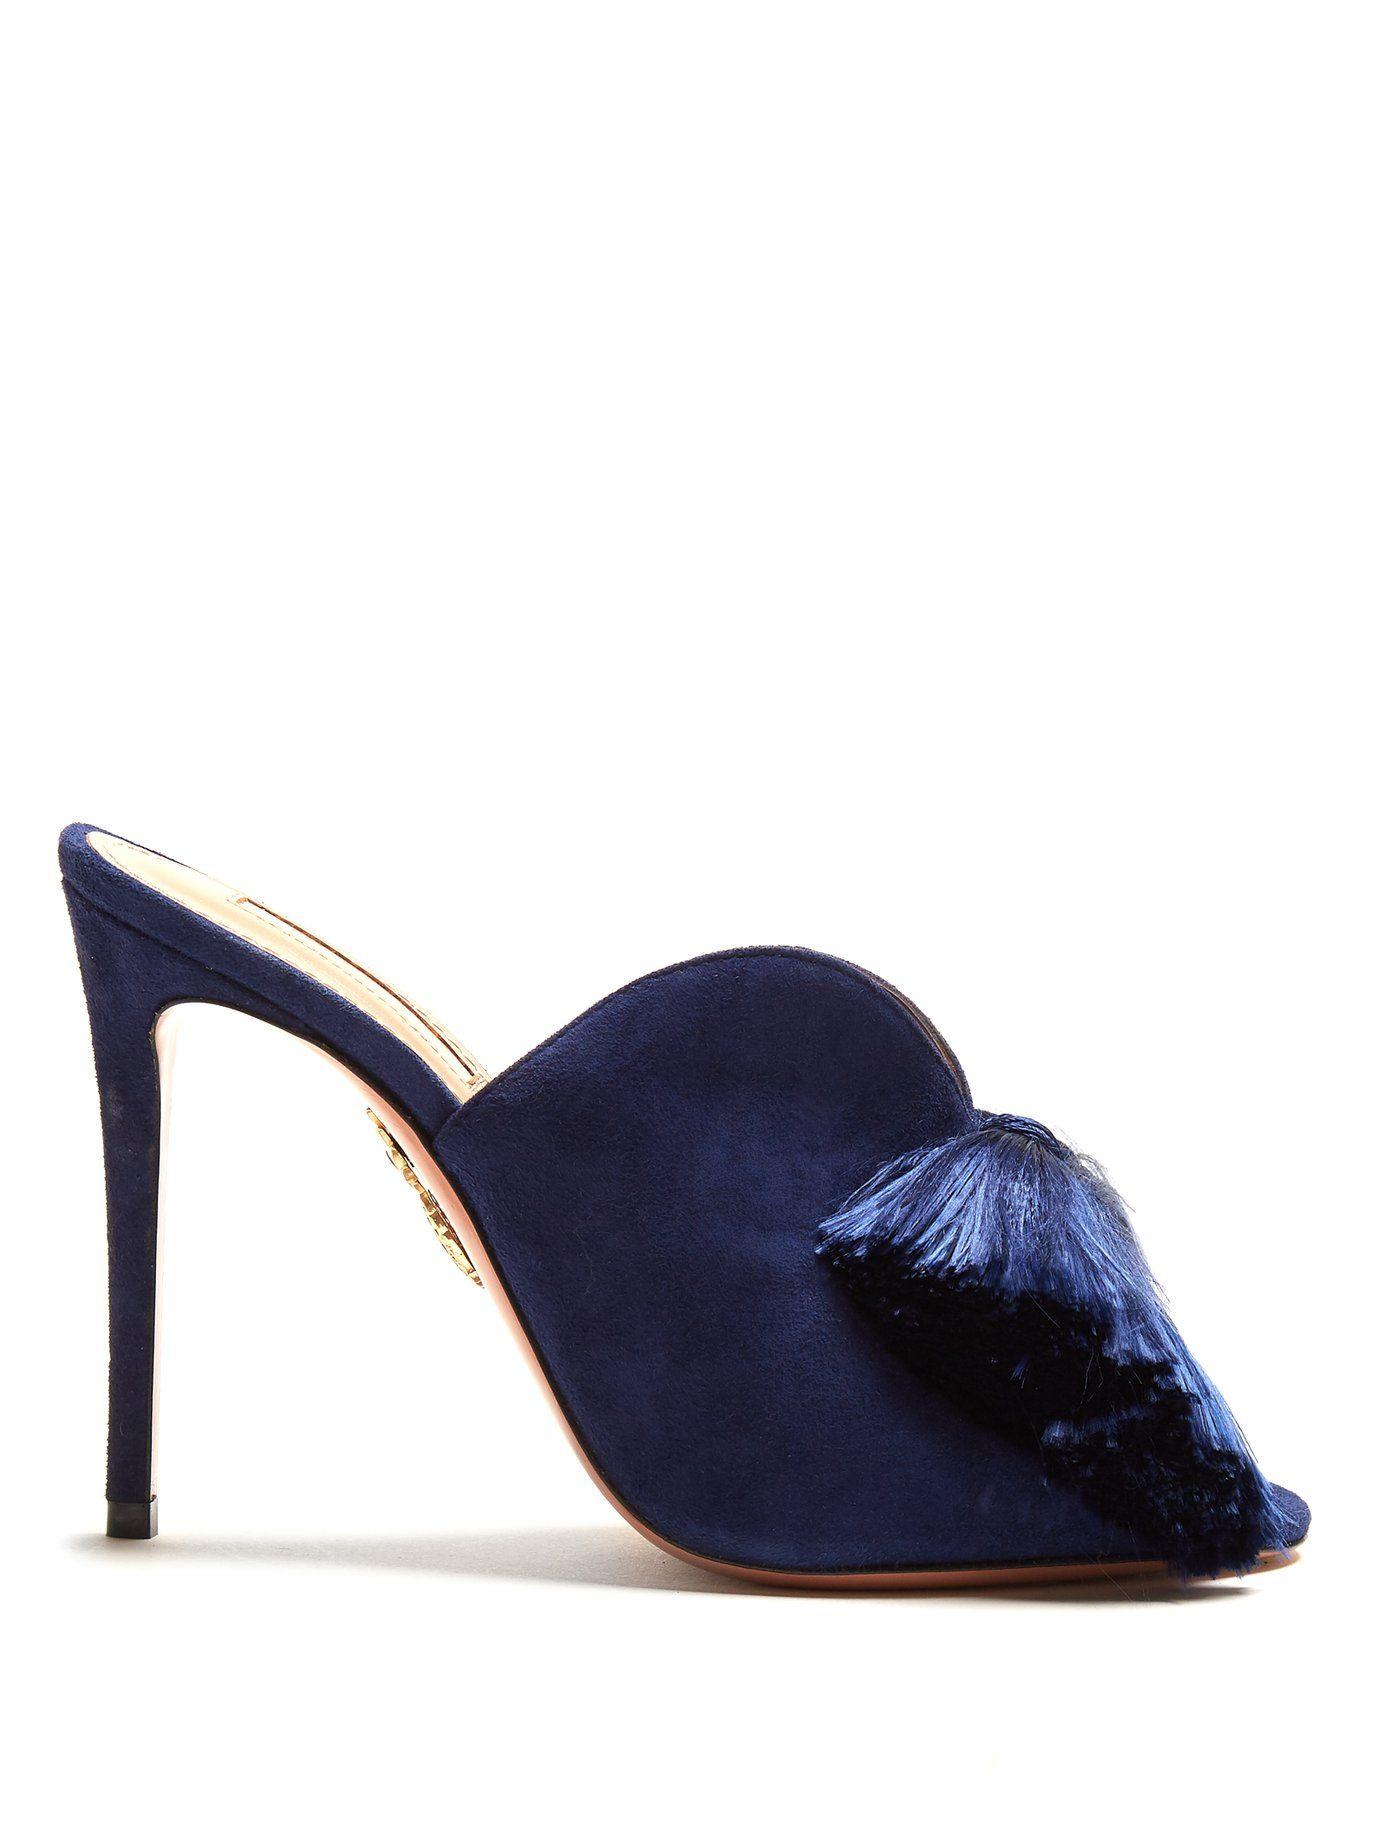 AQUAZZURA LOTUS BLOSSOM 105 TASSEL-EMBELLISHED SUEDE MULES.  aquazzura   shoes   93363c76e7e5